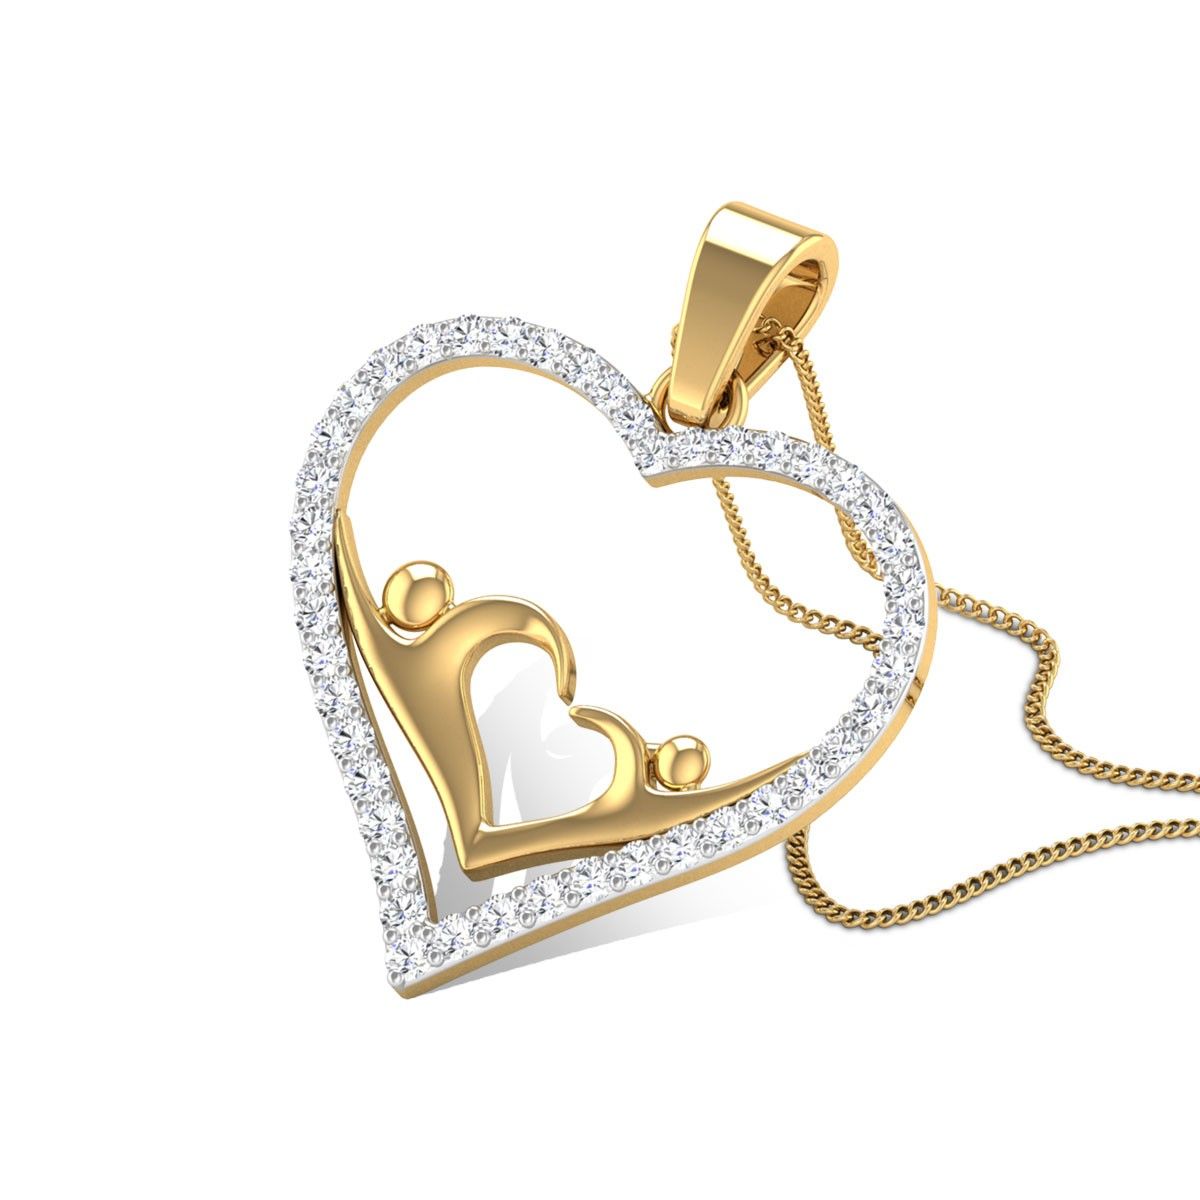 Cynthiana Diamond Pendant